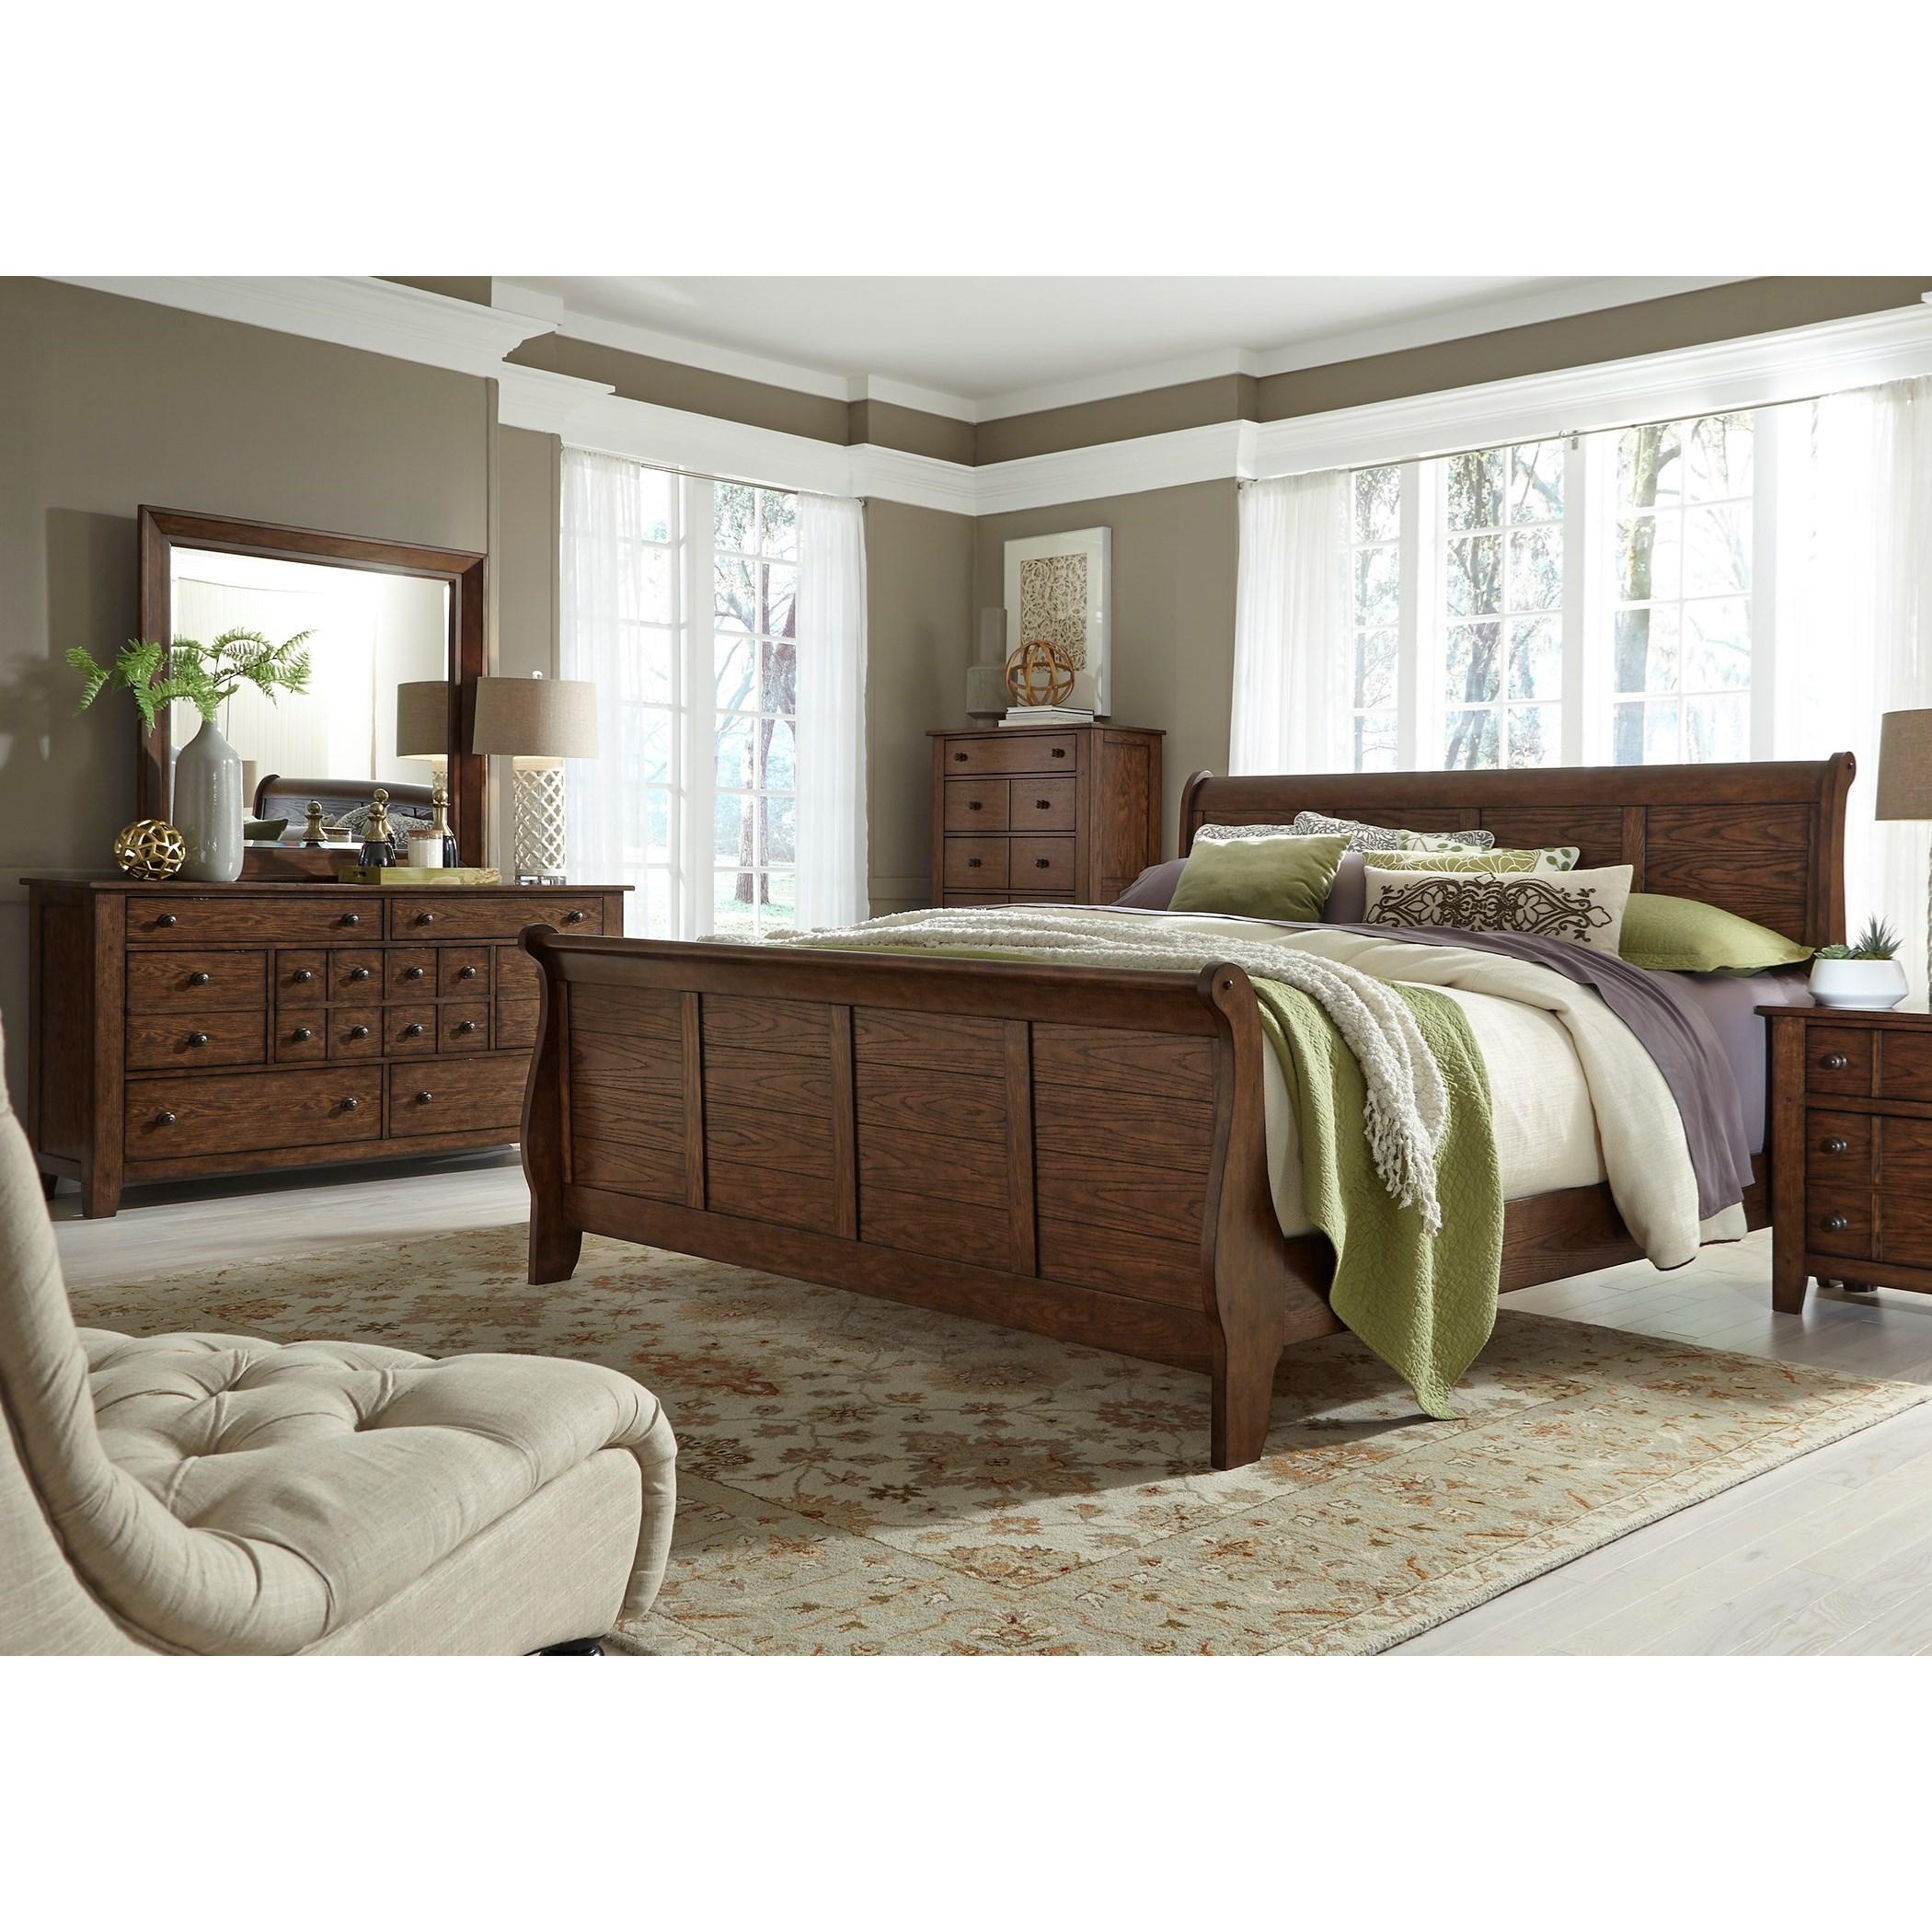 Liberty Furniture Grandpa's Cabin Queen Bedroom Group - Item Number: 375-BR-QSLDM